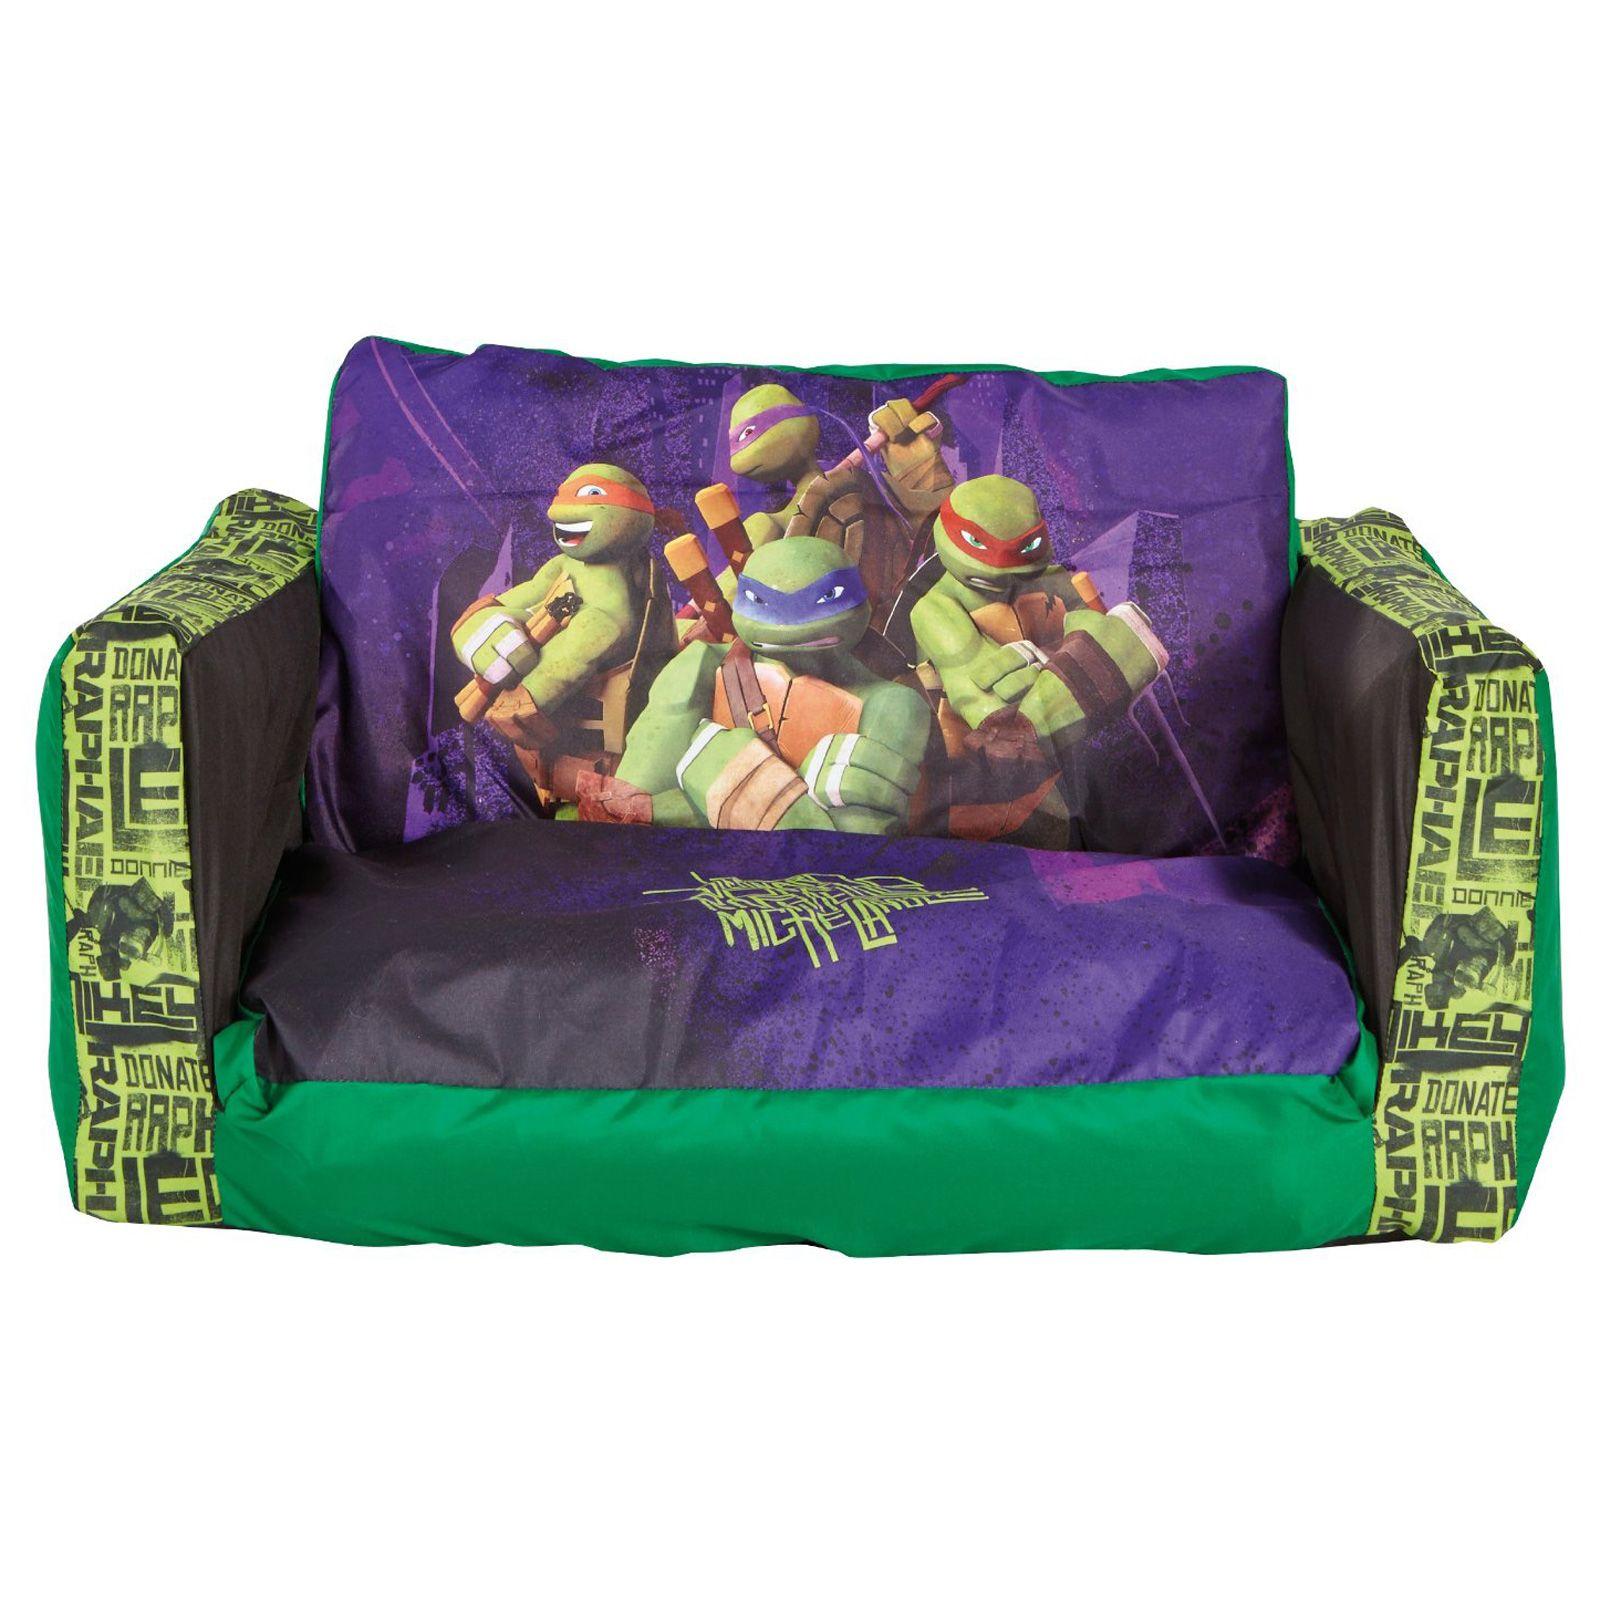 Teenage mutant ninja turtles flip out sofa bed new for Sofa bed 8101